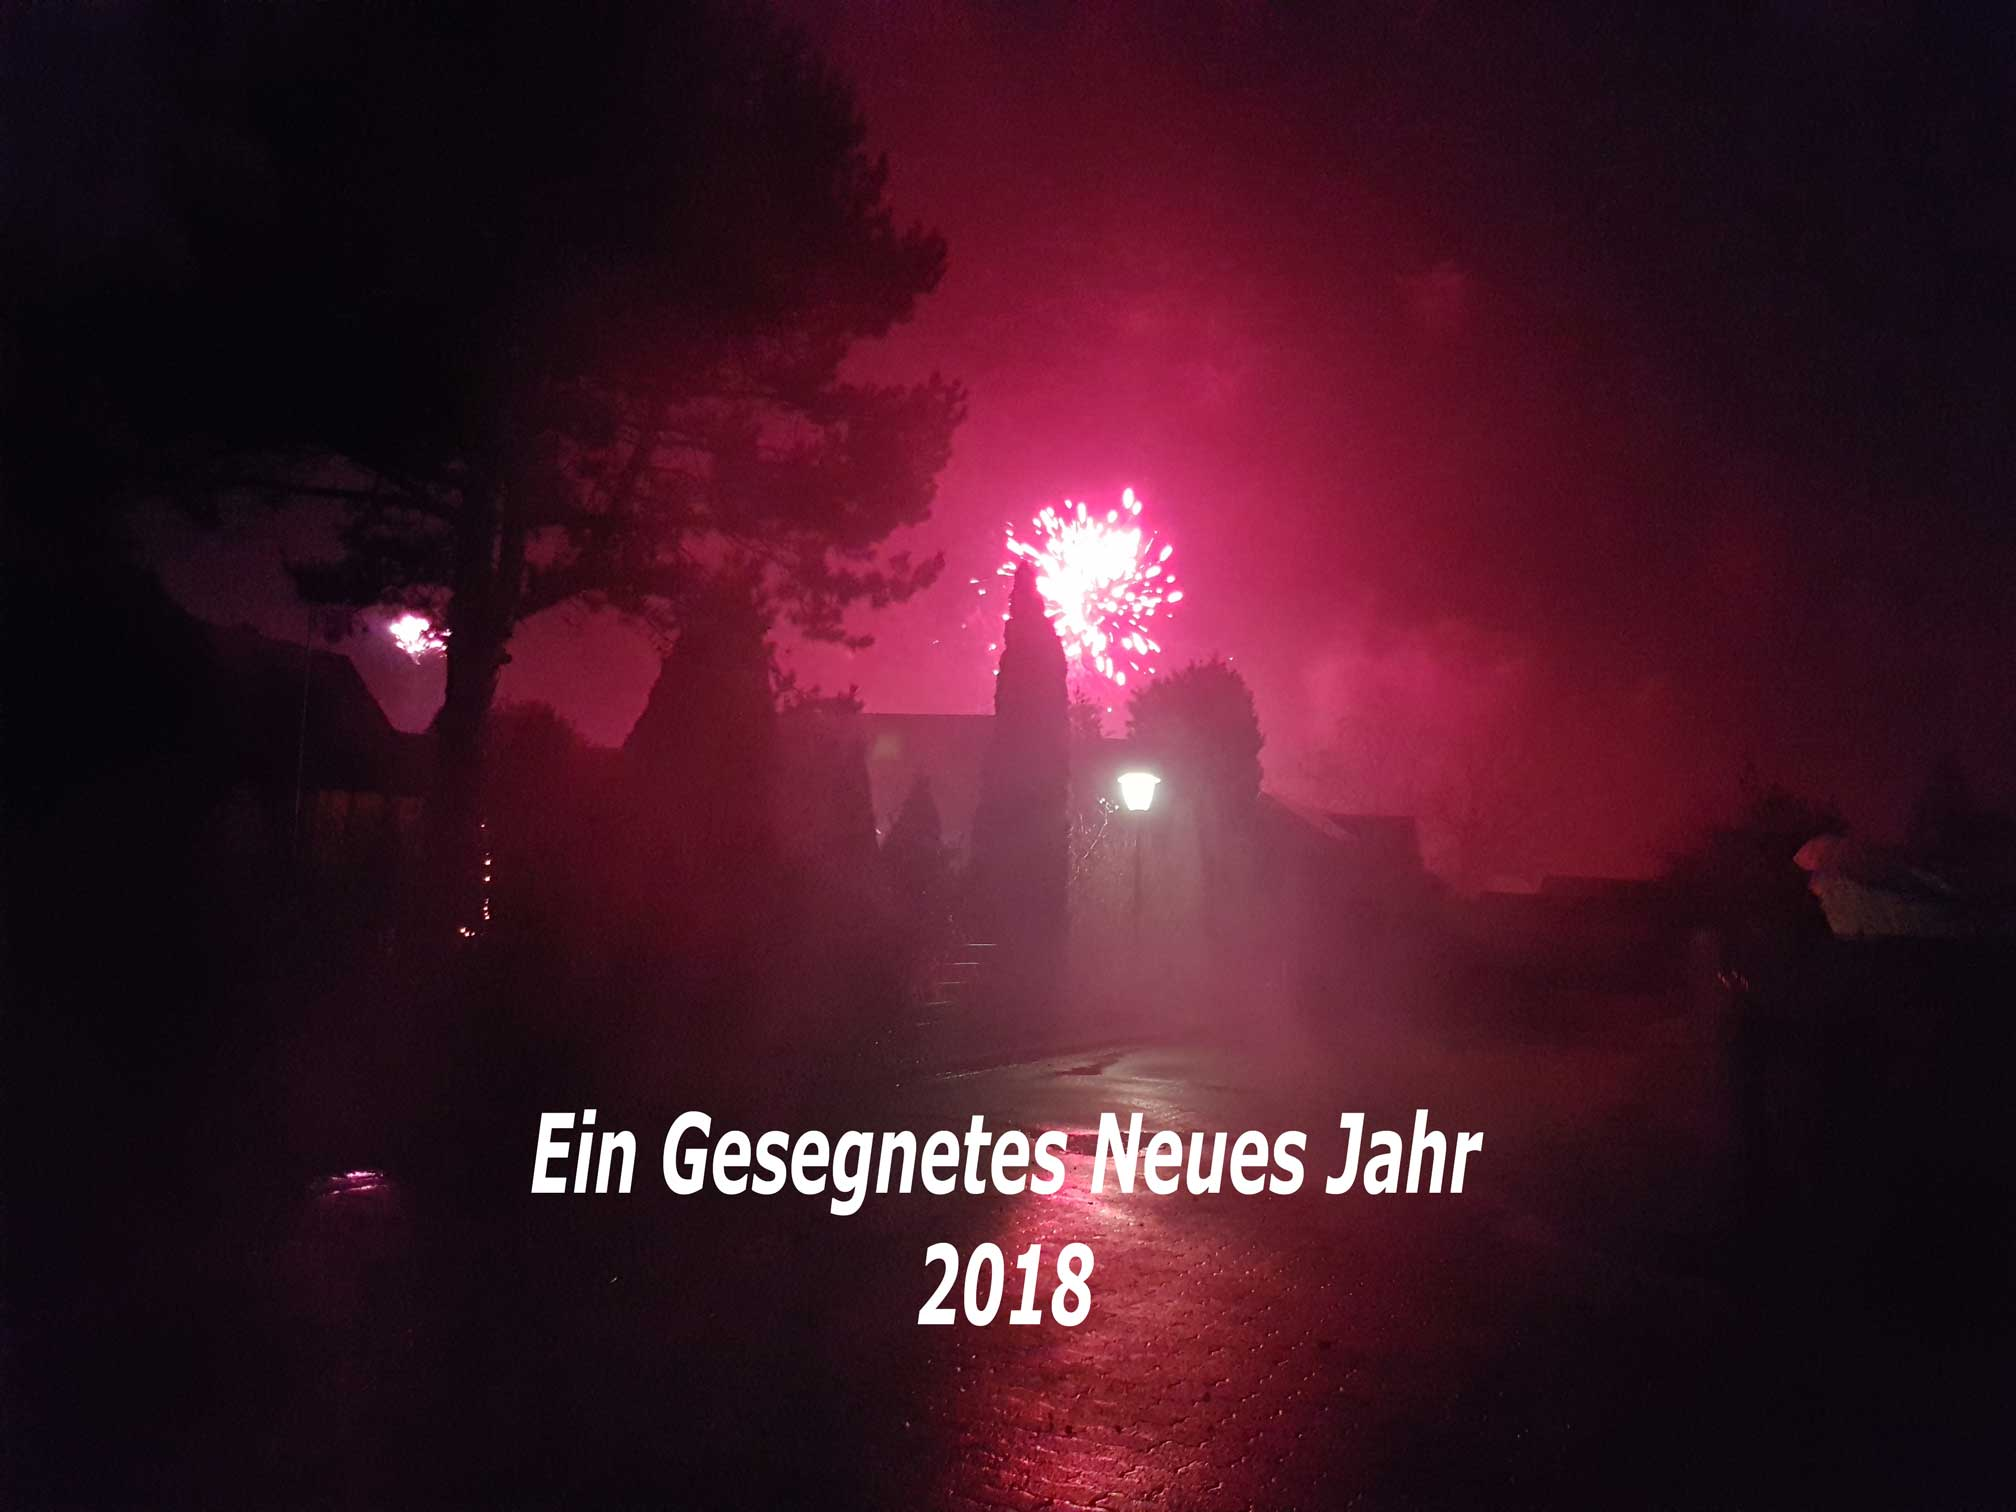 Gesegnetes-Neues-Jahr-2018 – deborrah\'s